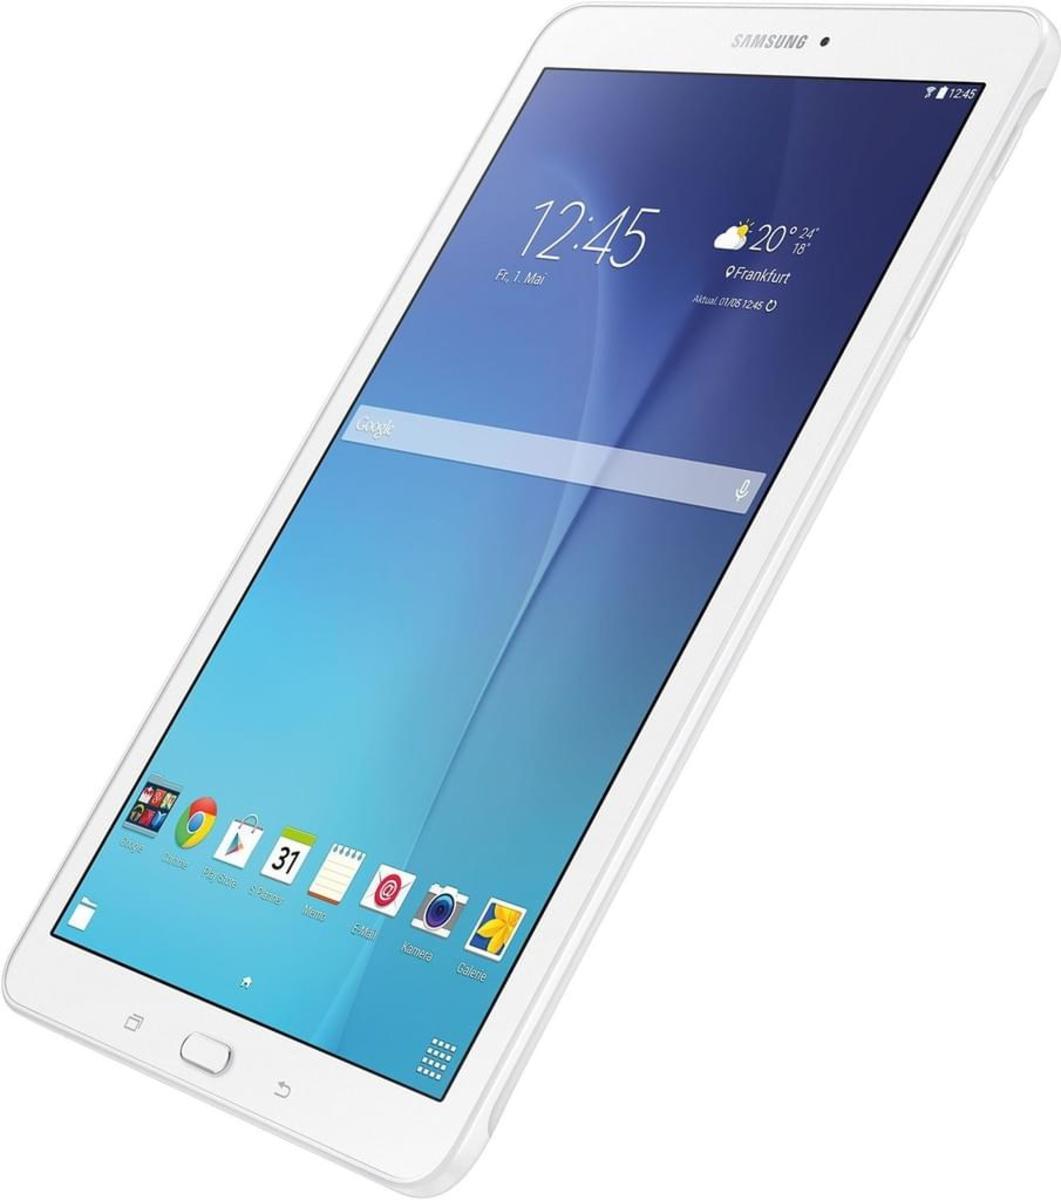 Bild 3 von Samsung Galaxy Tab E SM-T560 Tablet-PC - 24,4 cm (9,6 Zoll)